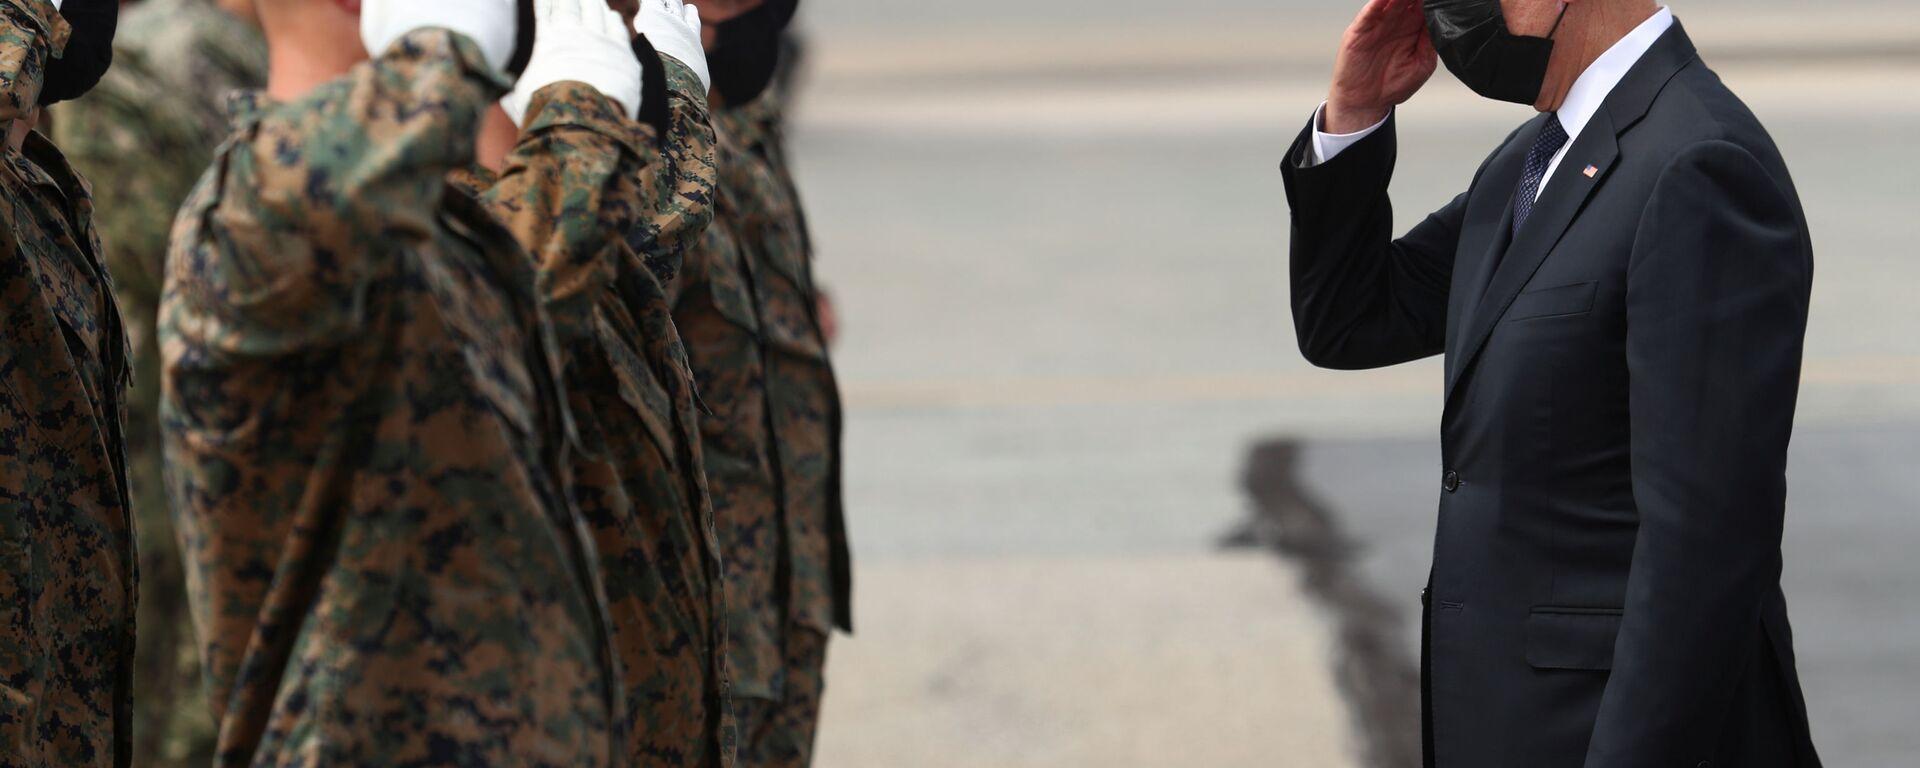 U.S. President Joe Biden salutes members of the U.S. Marine Corps Honor Guard before boarding Air Force One at Dover Air Force Base in Dover, Delaware, U.S., August 29, 2021 - Sputnik International, 1920, 29.08.2021